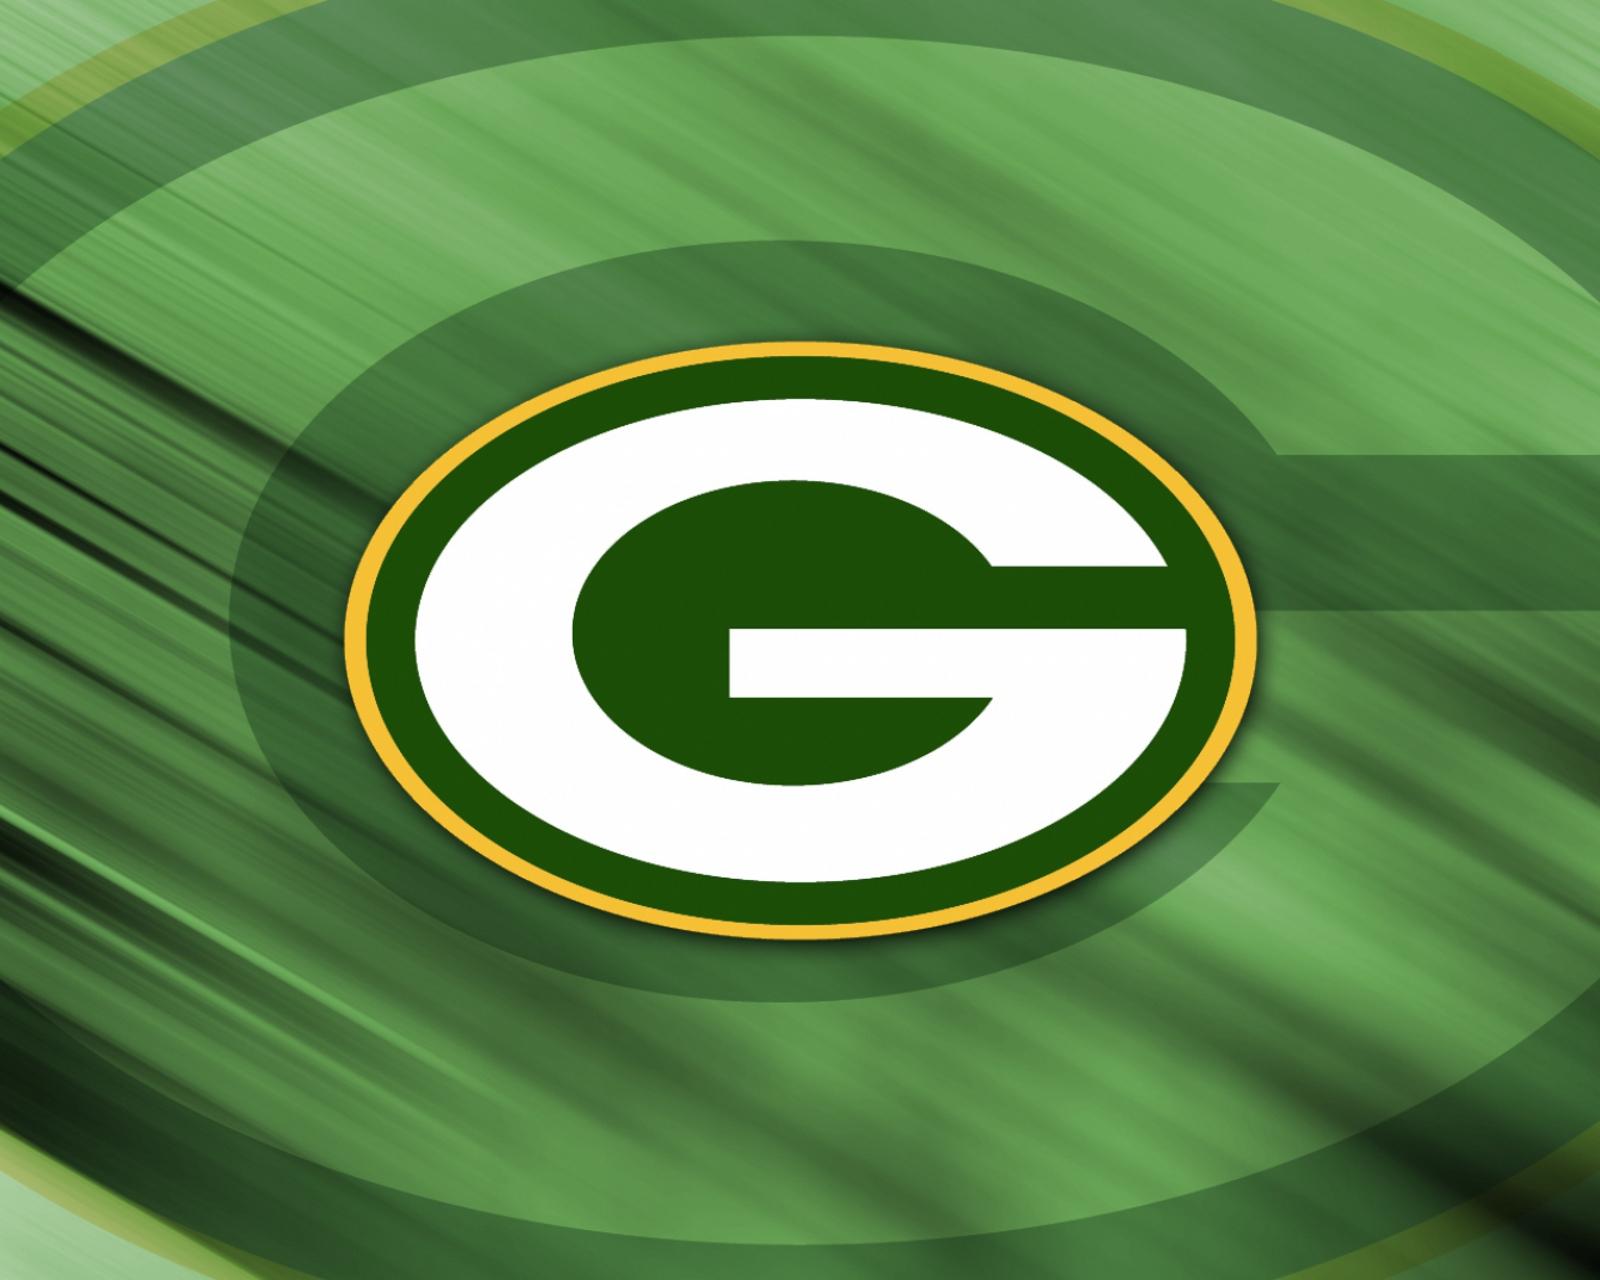 GREEN BAY PACKERS nfl football rg wallpaper 1600x1280 1600x1280